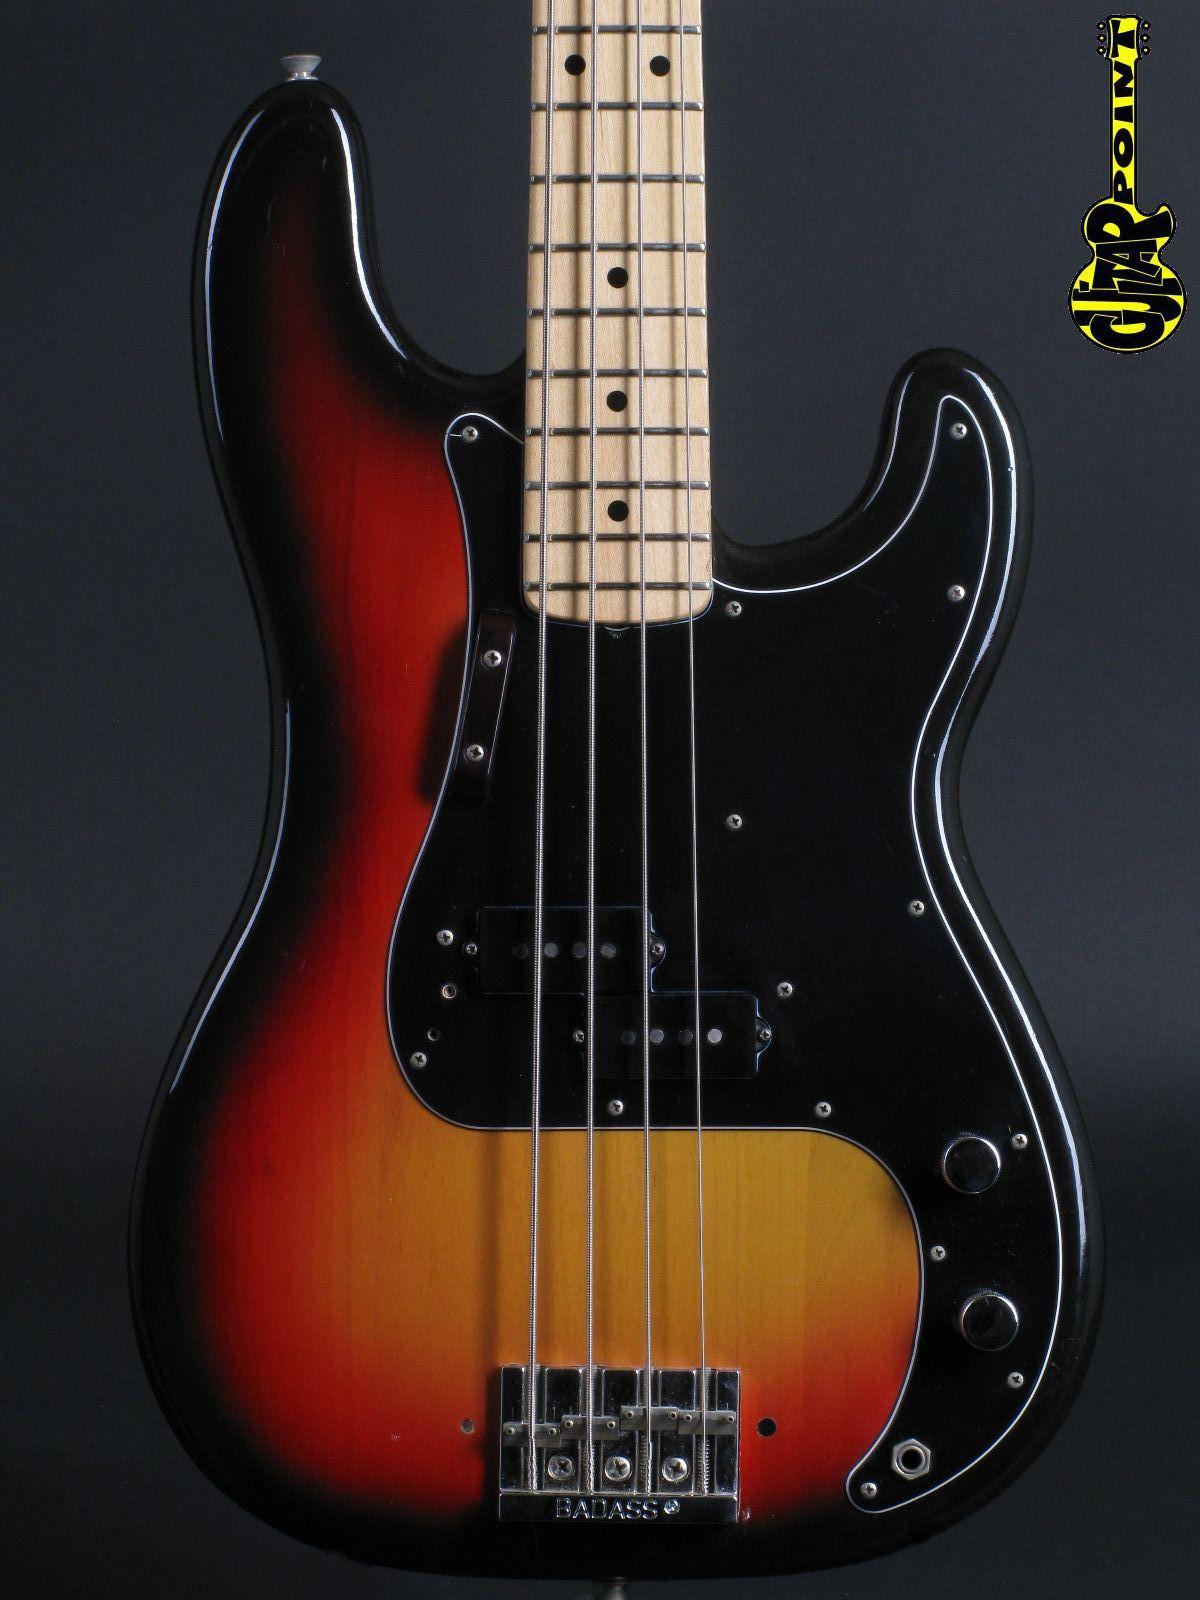 1975 Fender Precision Bass - 3-tone Sunburst